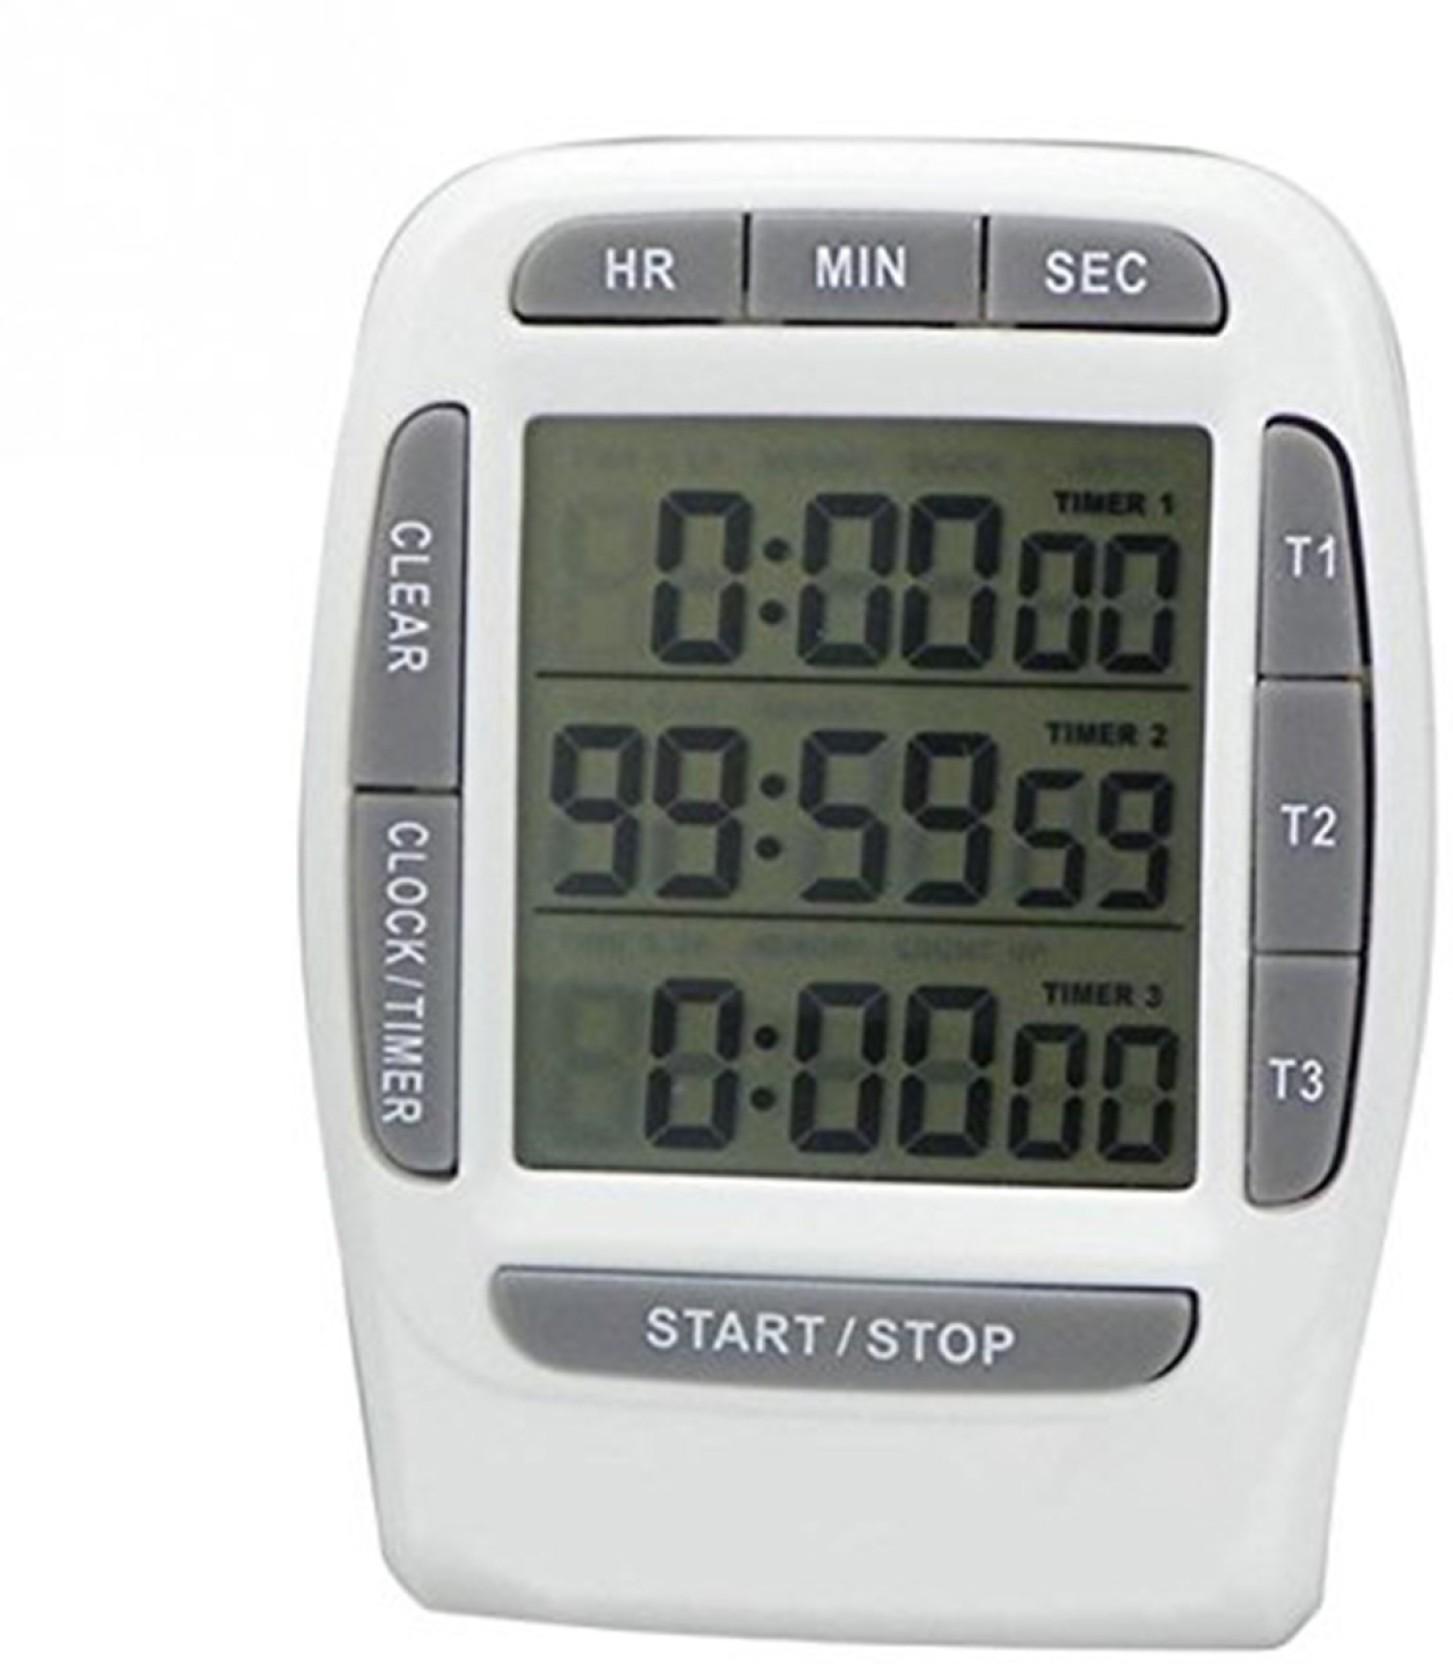 Triple Display Alarm Clock - Arm Designs